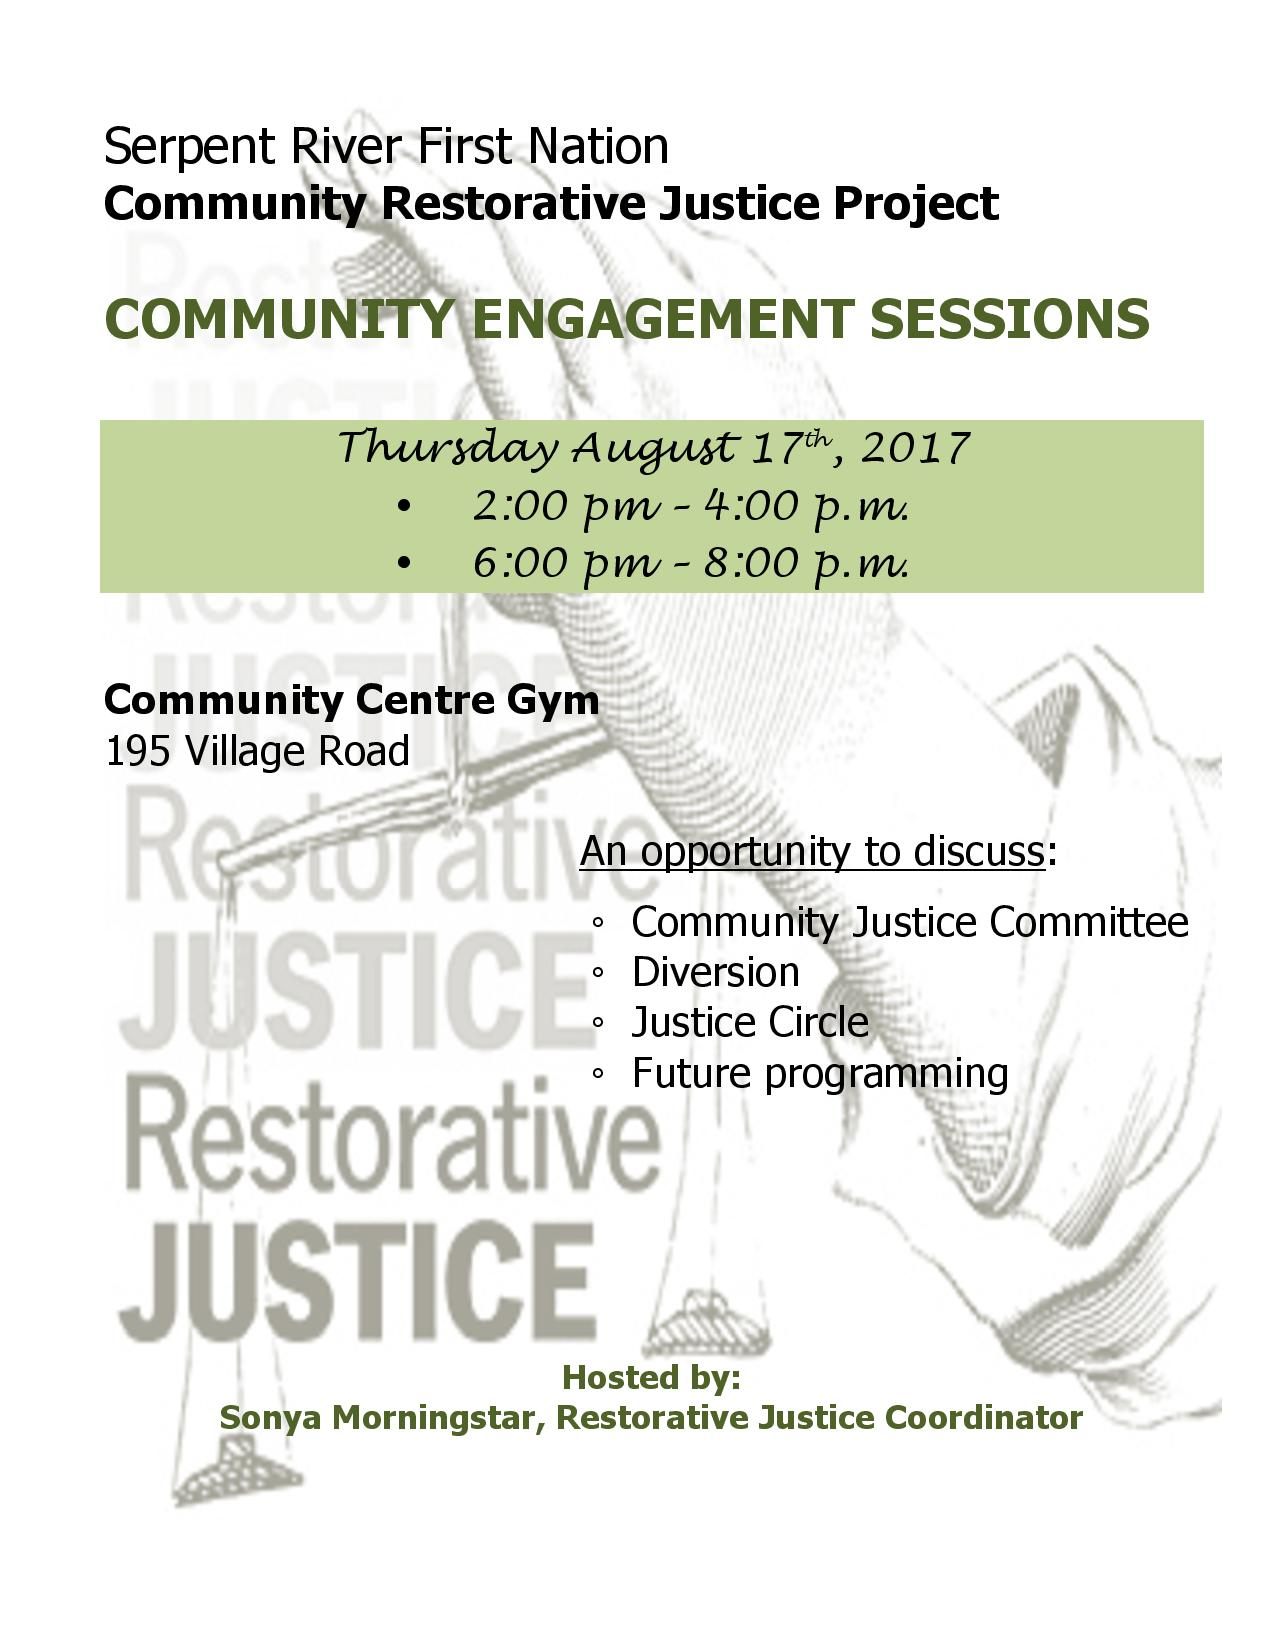 SRFN Restorative Justice Sessions